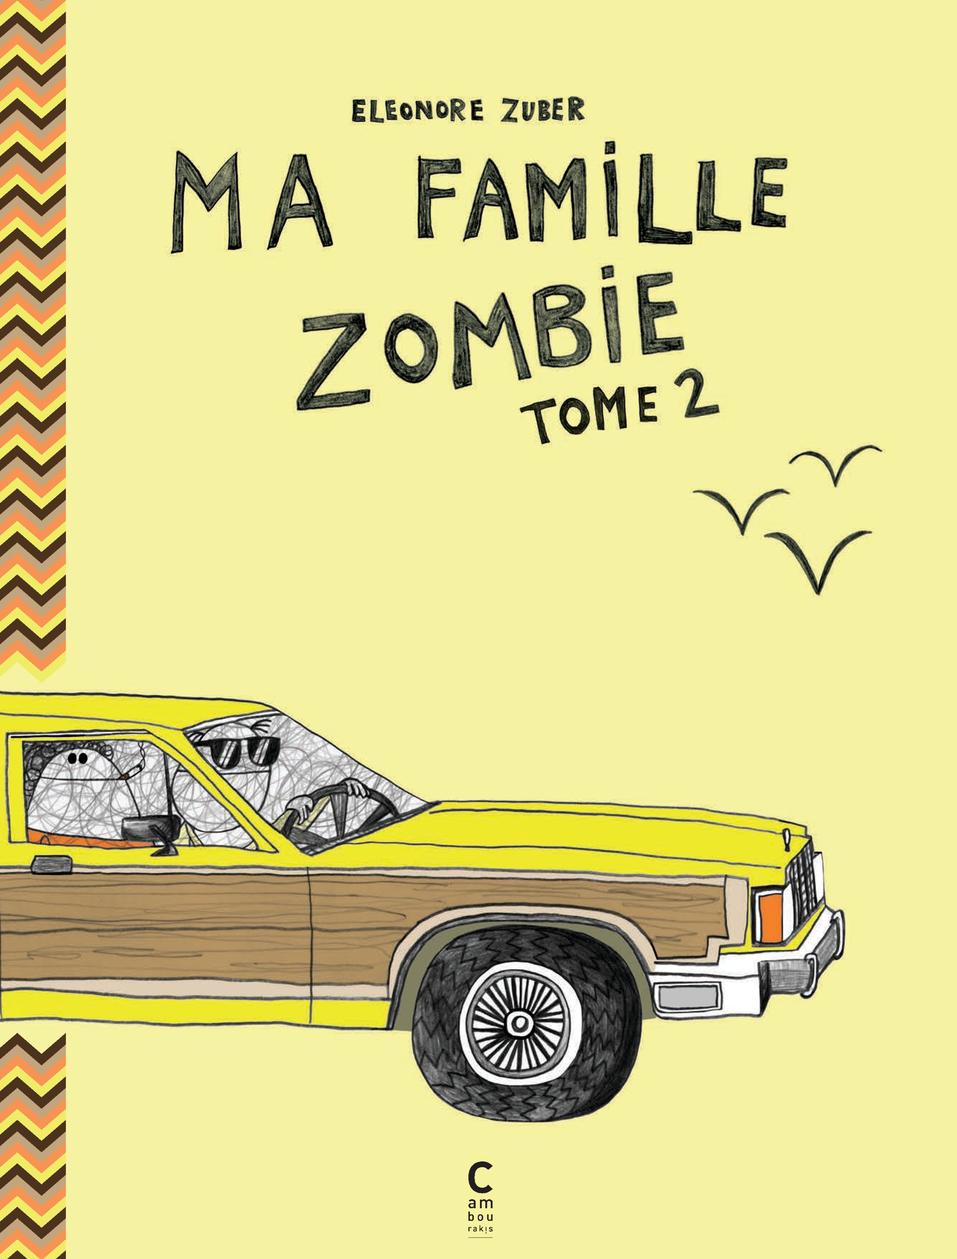 MA FAMILLE ZOMBIE VOL. 2